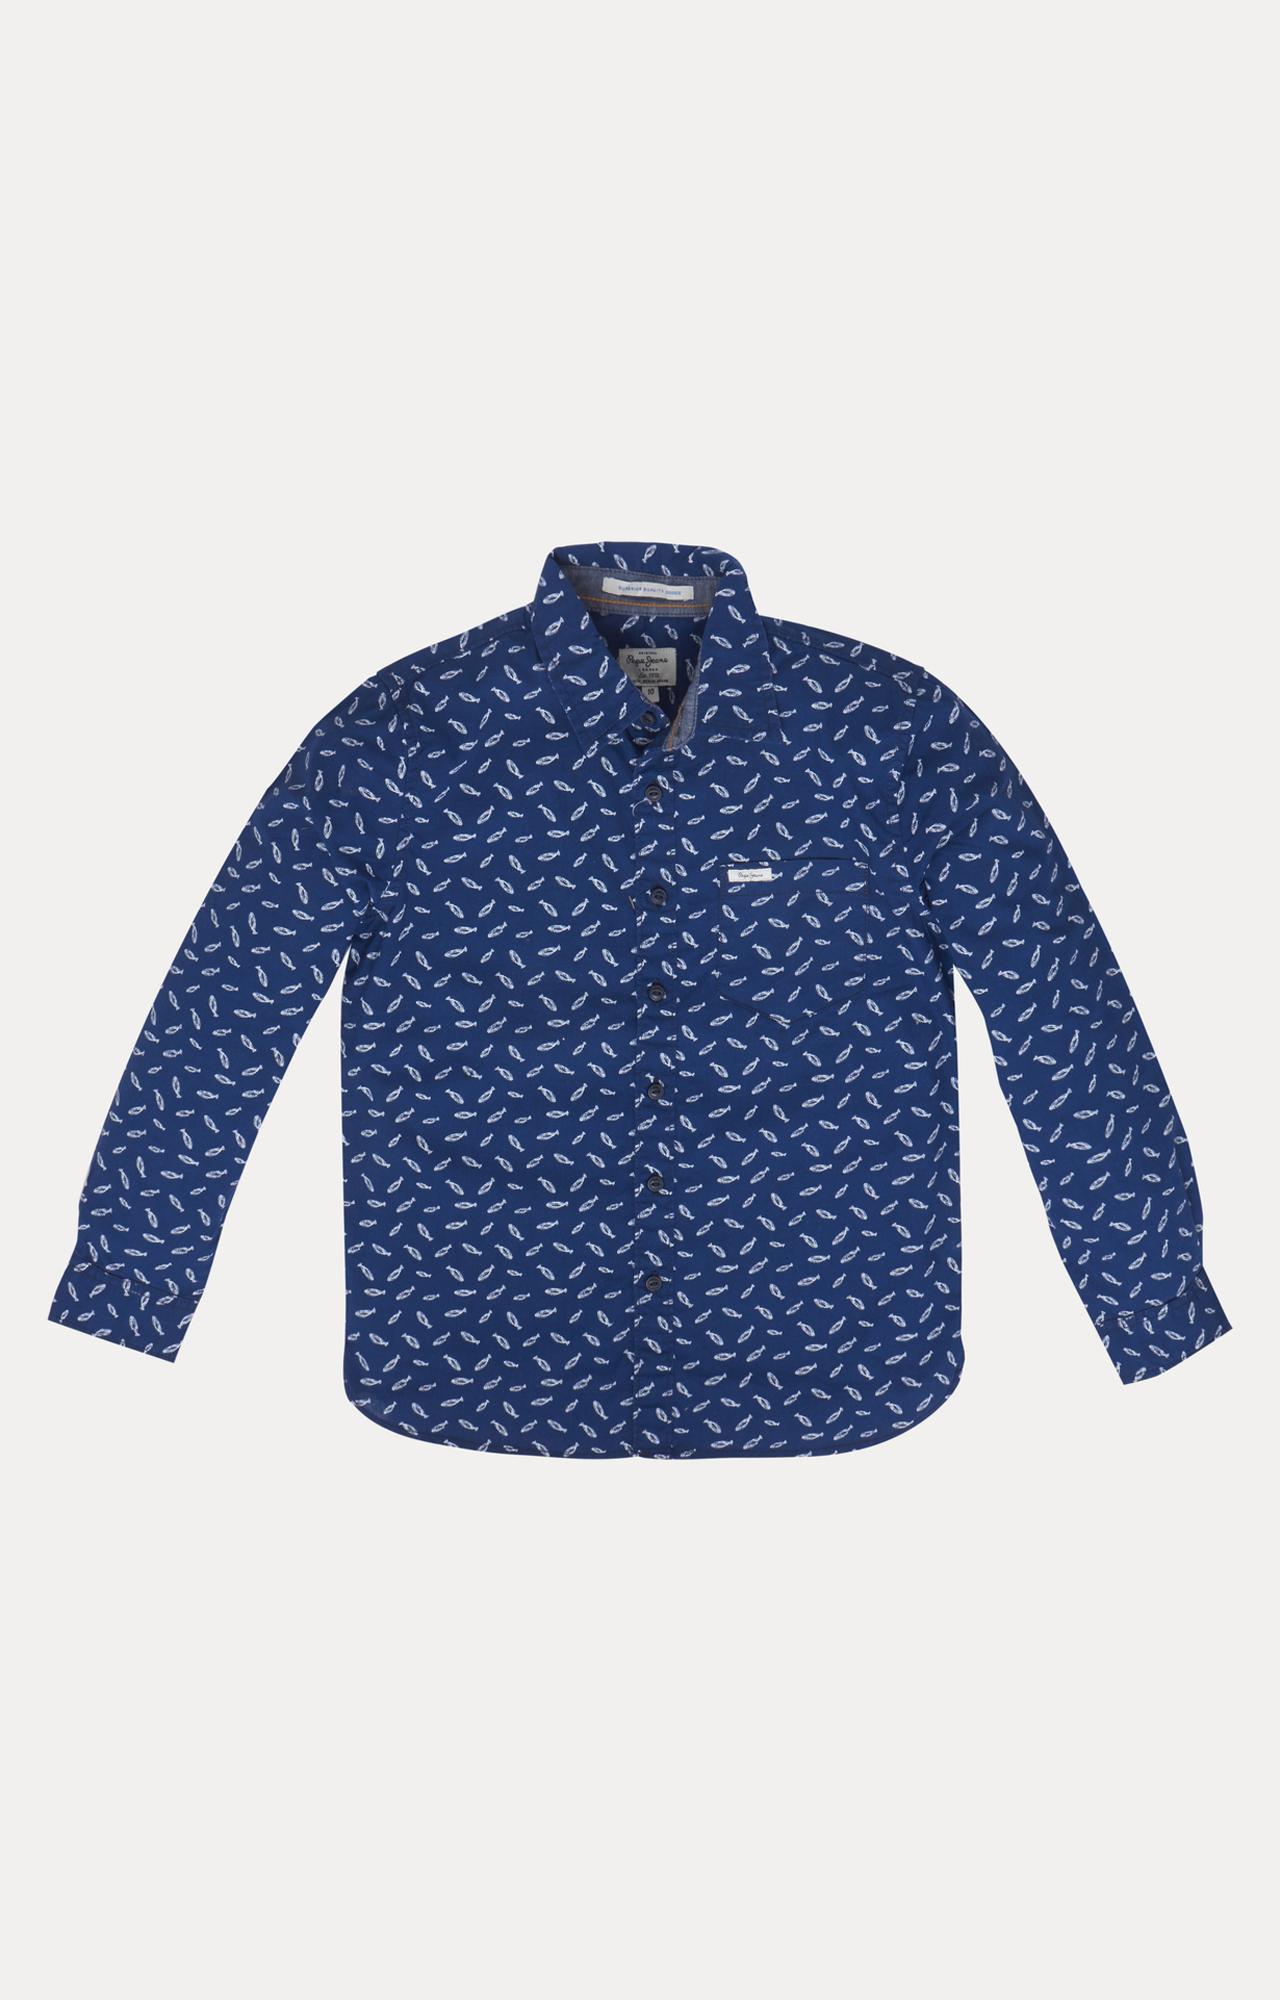 Pepe Jeans   Blue Printed Shirt